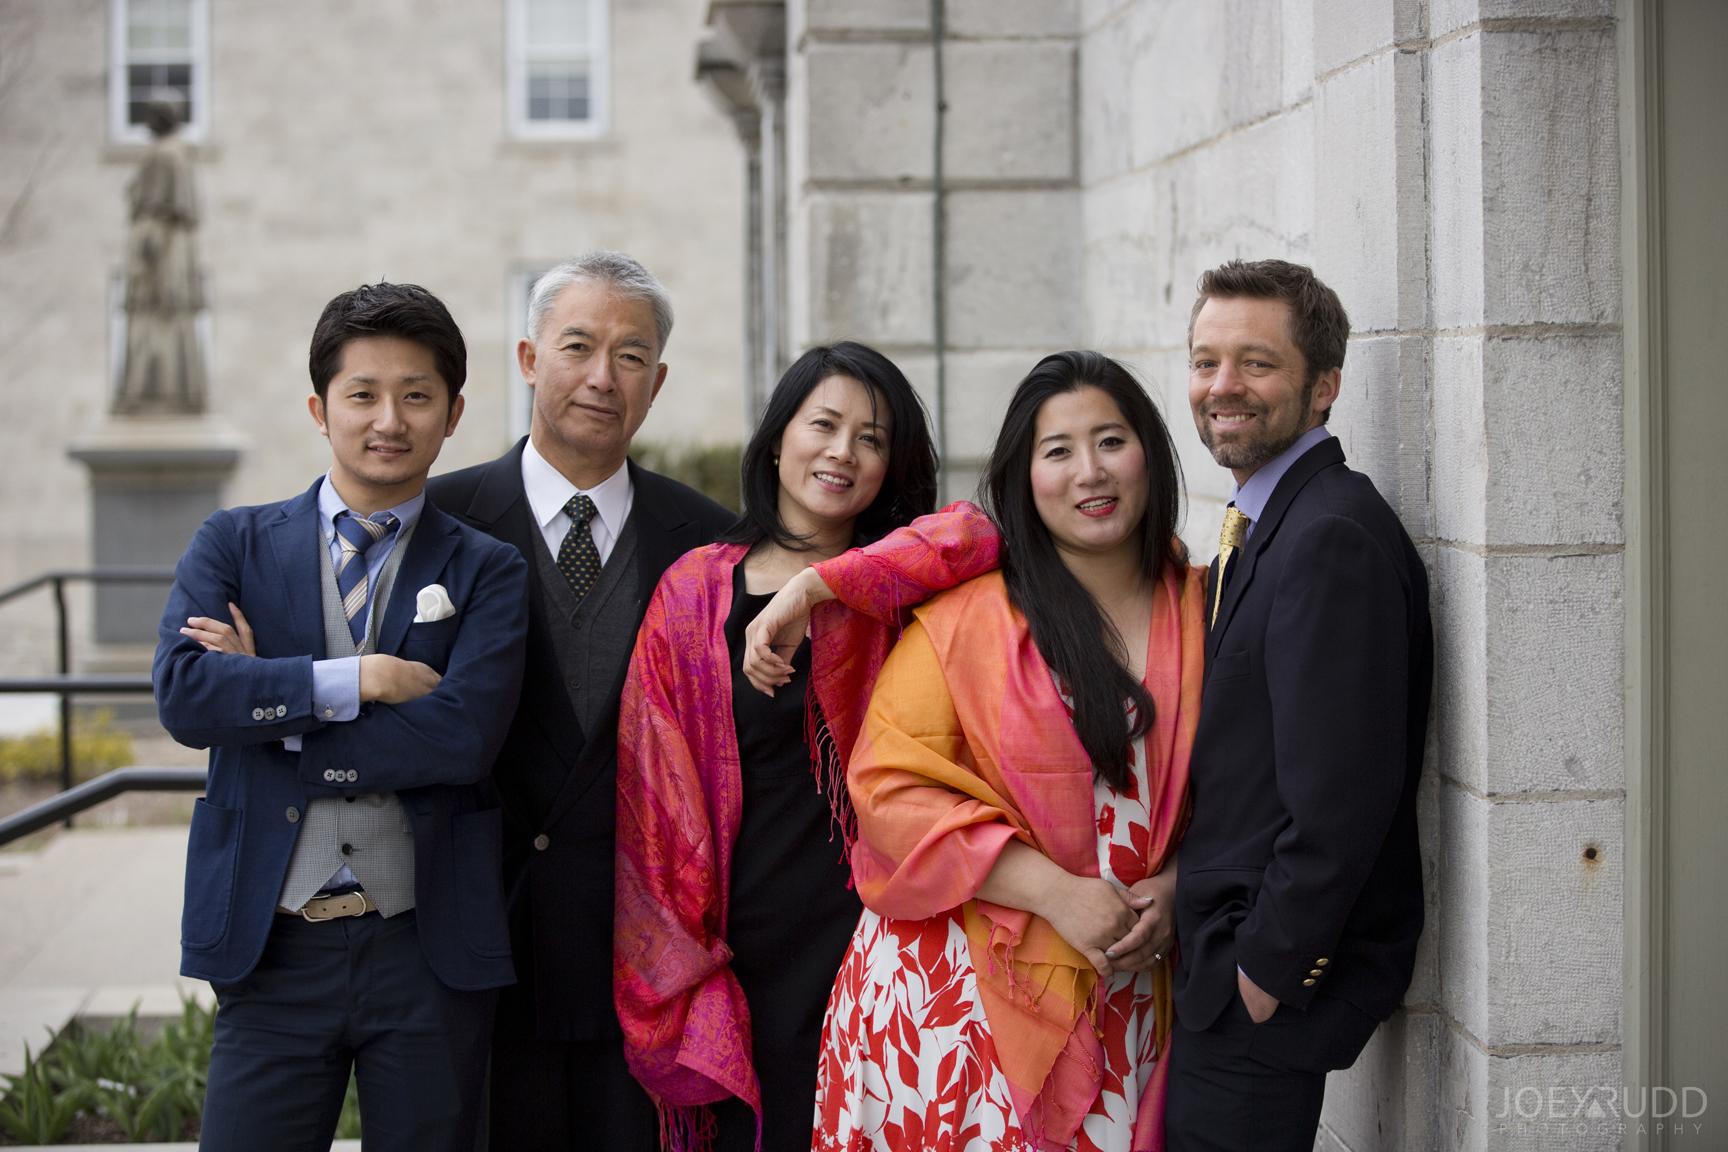 Ottawa Elopement Wedding Photographer Joey Rudd Photography Notre Dame